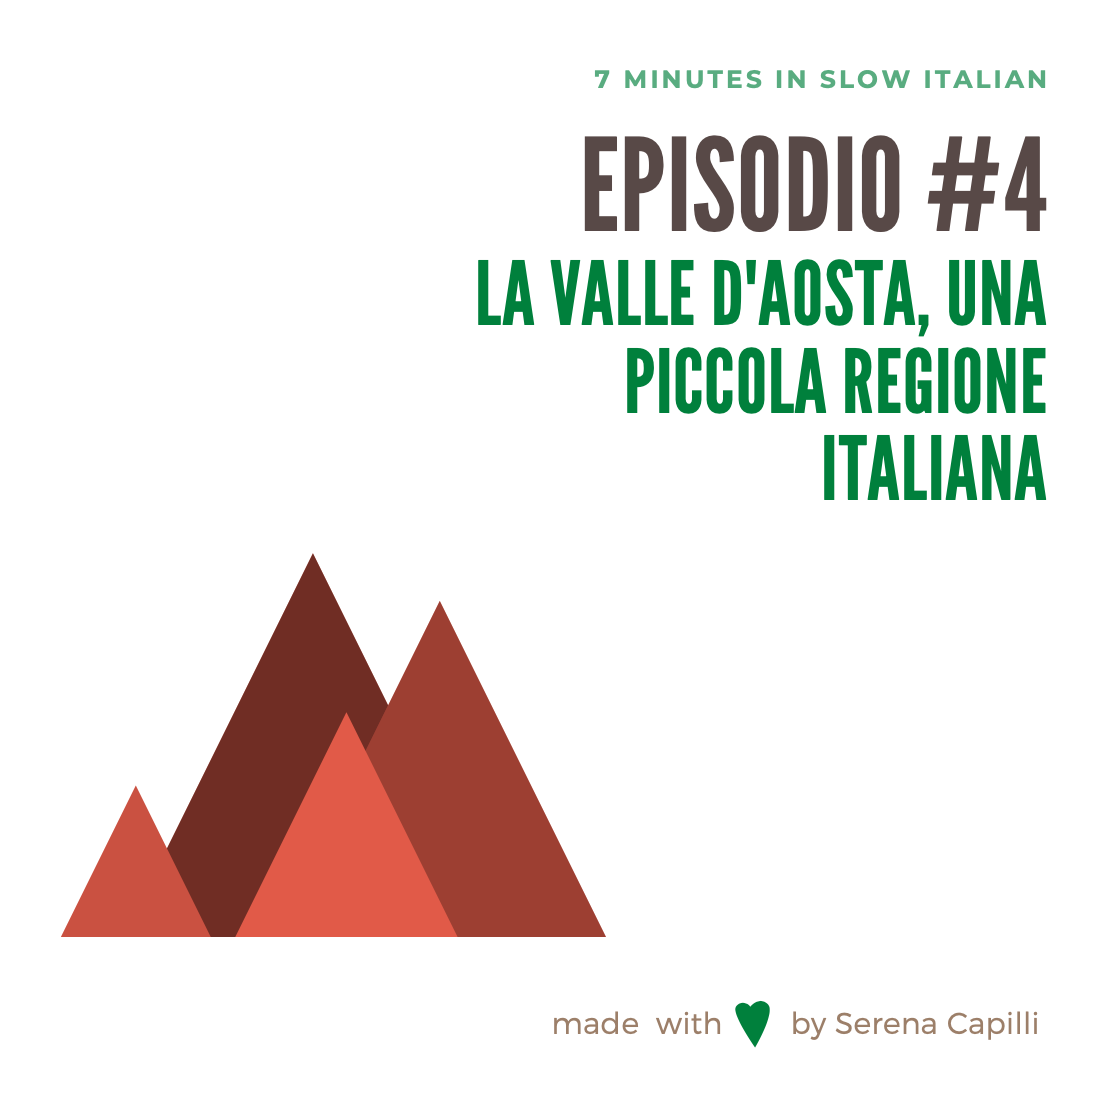 EPISODIO #4 – LAVALLE D'AOSTA